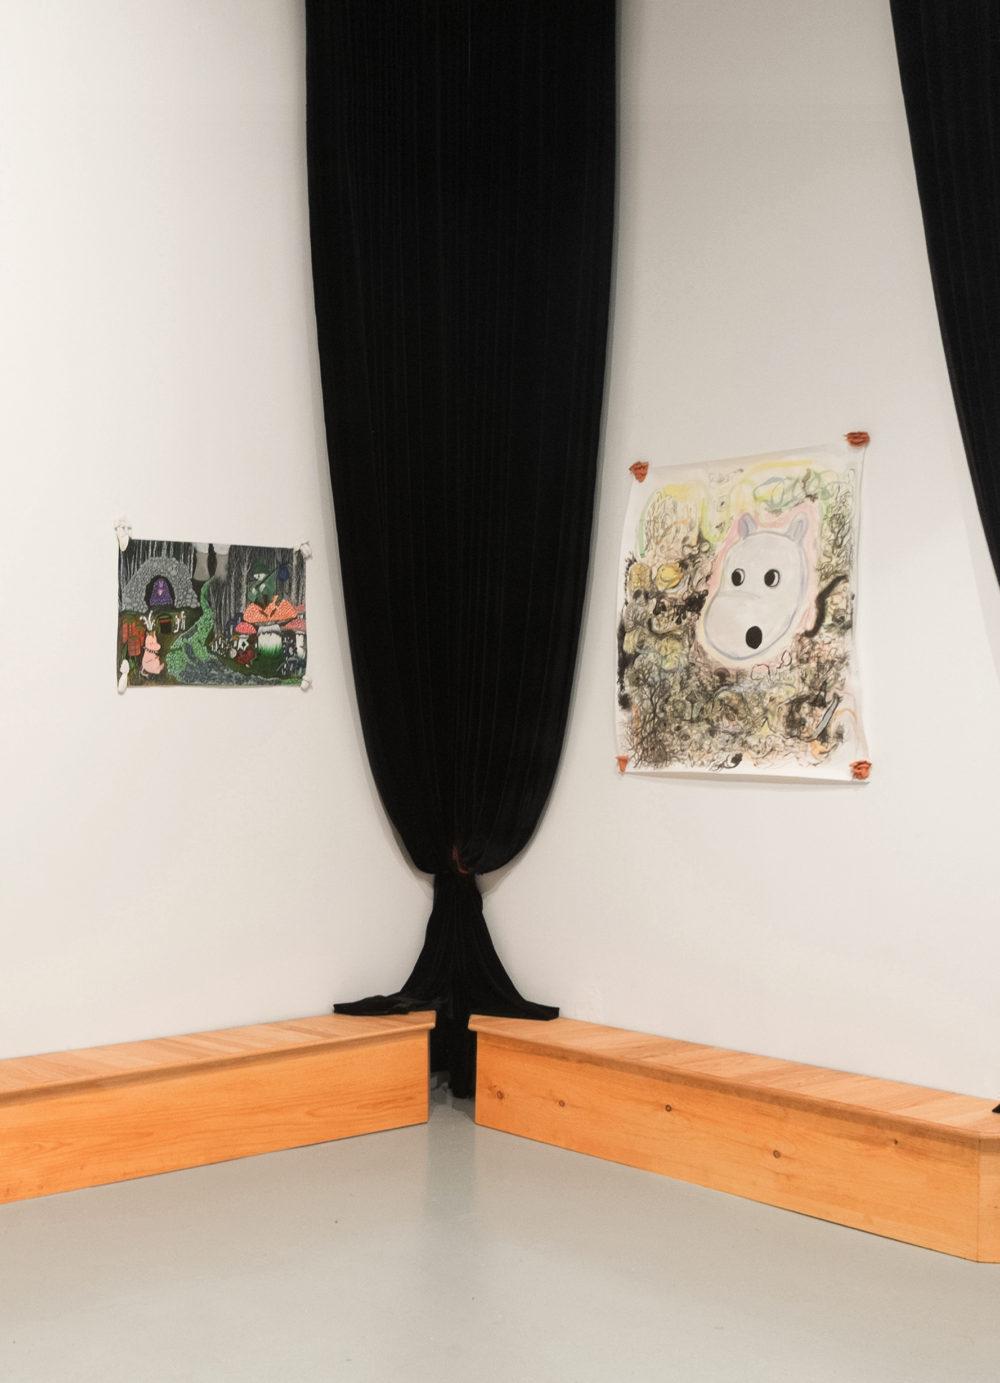 Filip Olszewski Theater Stage and Theater Curtains, 2016 Oak, Pine, Wood stain Velvet, thread, metal